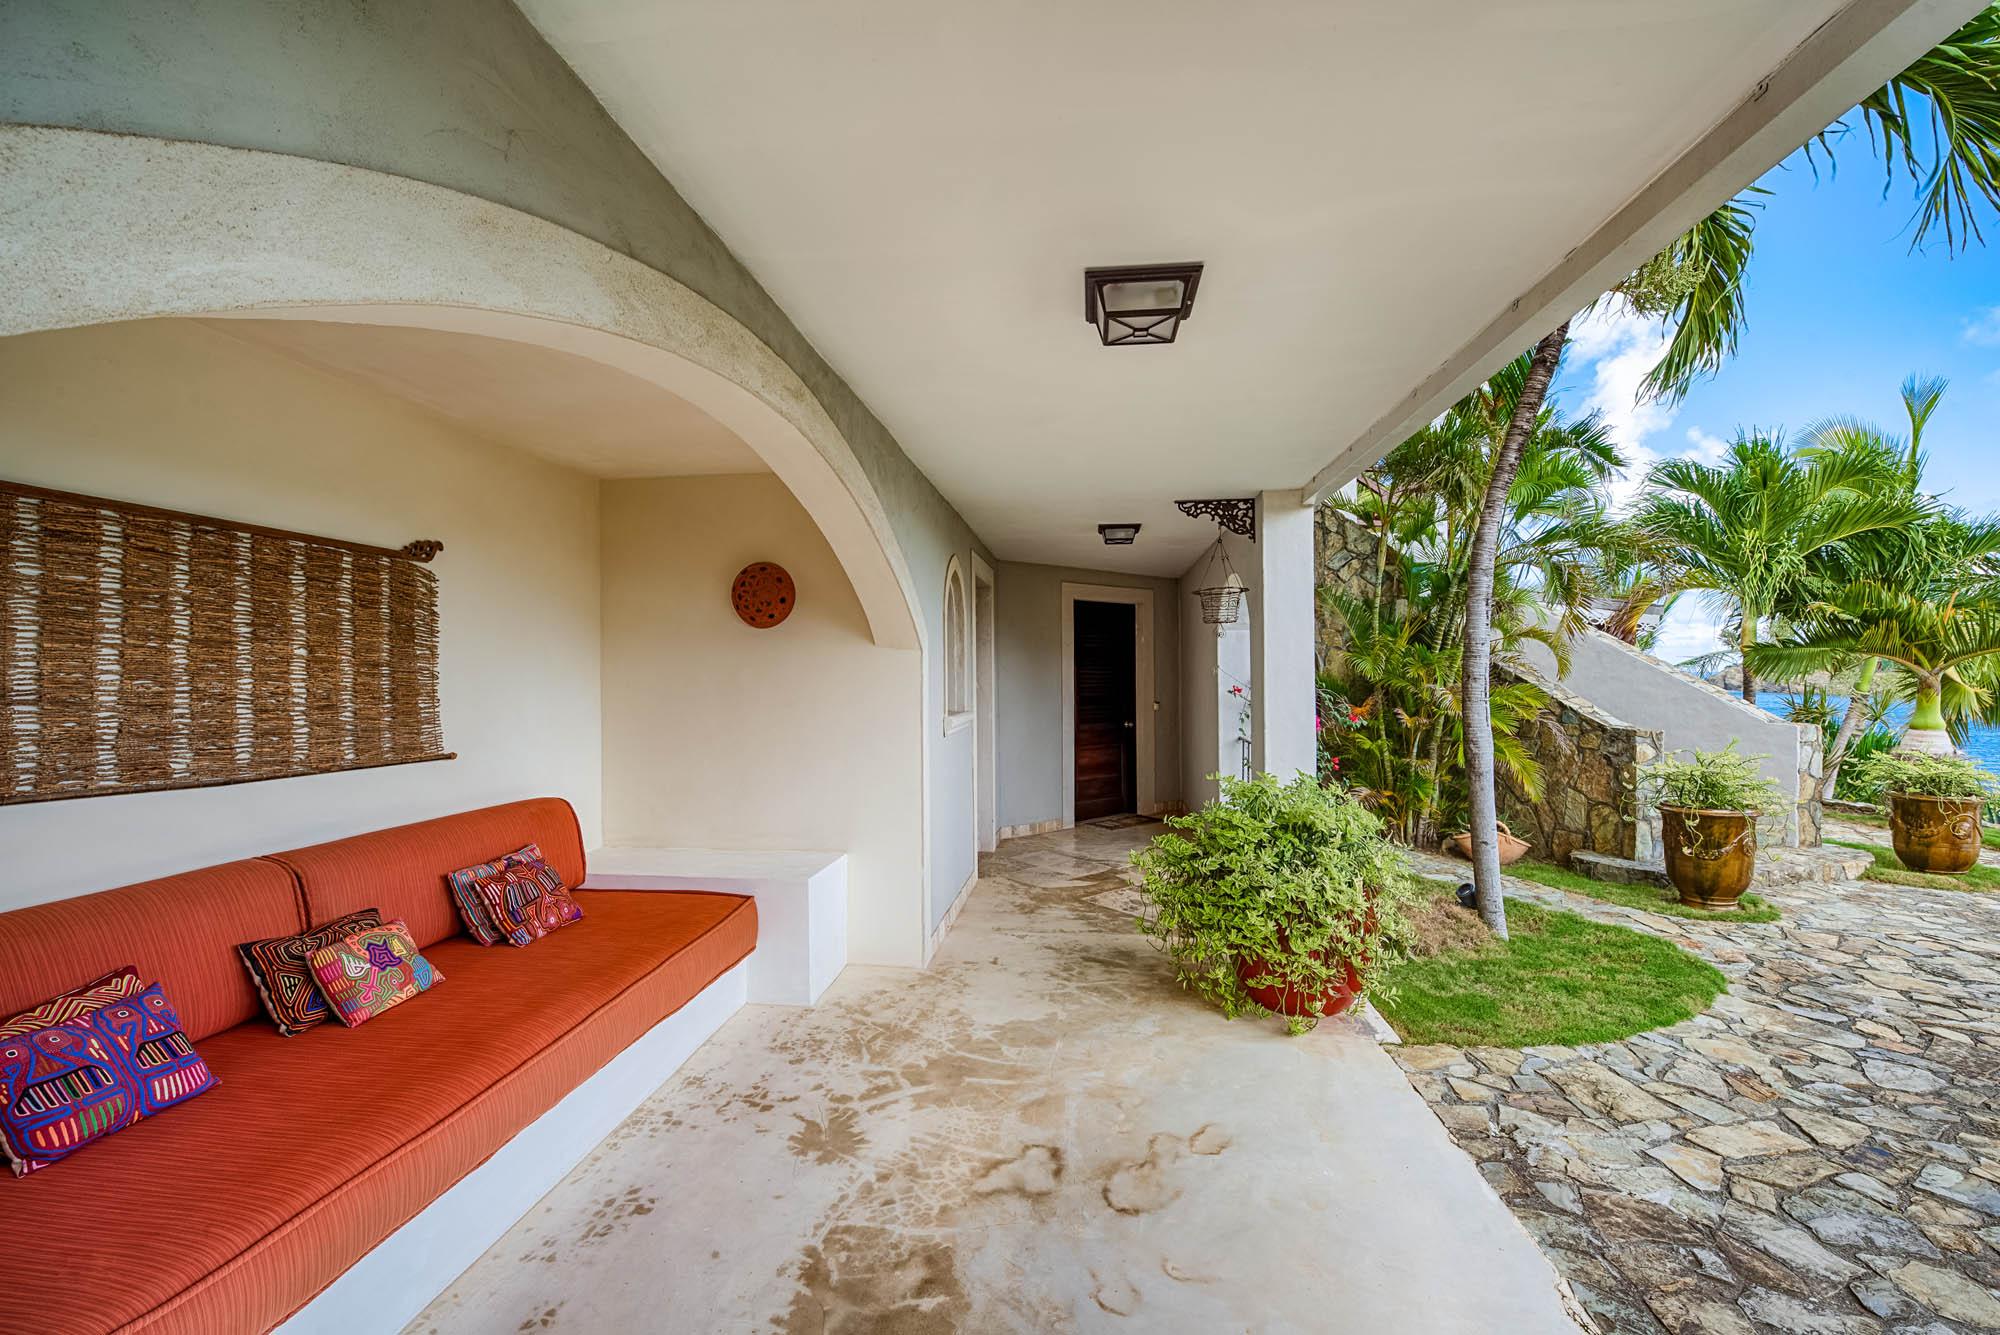 Enjoy your holidays at this luxury St.Martin villa rental.